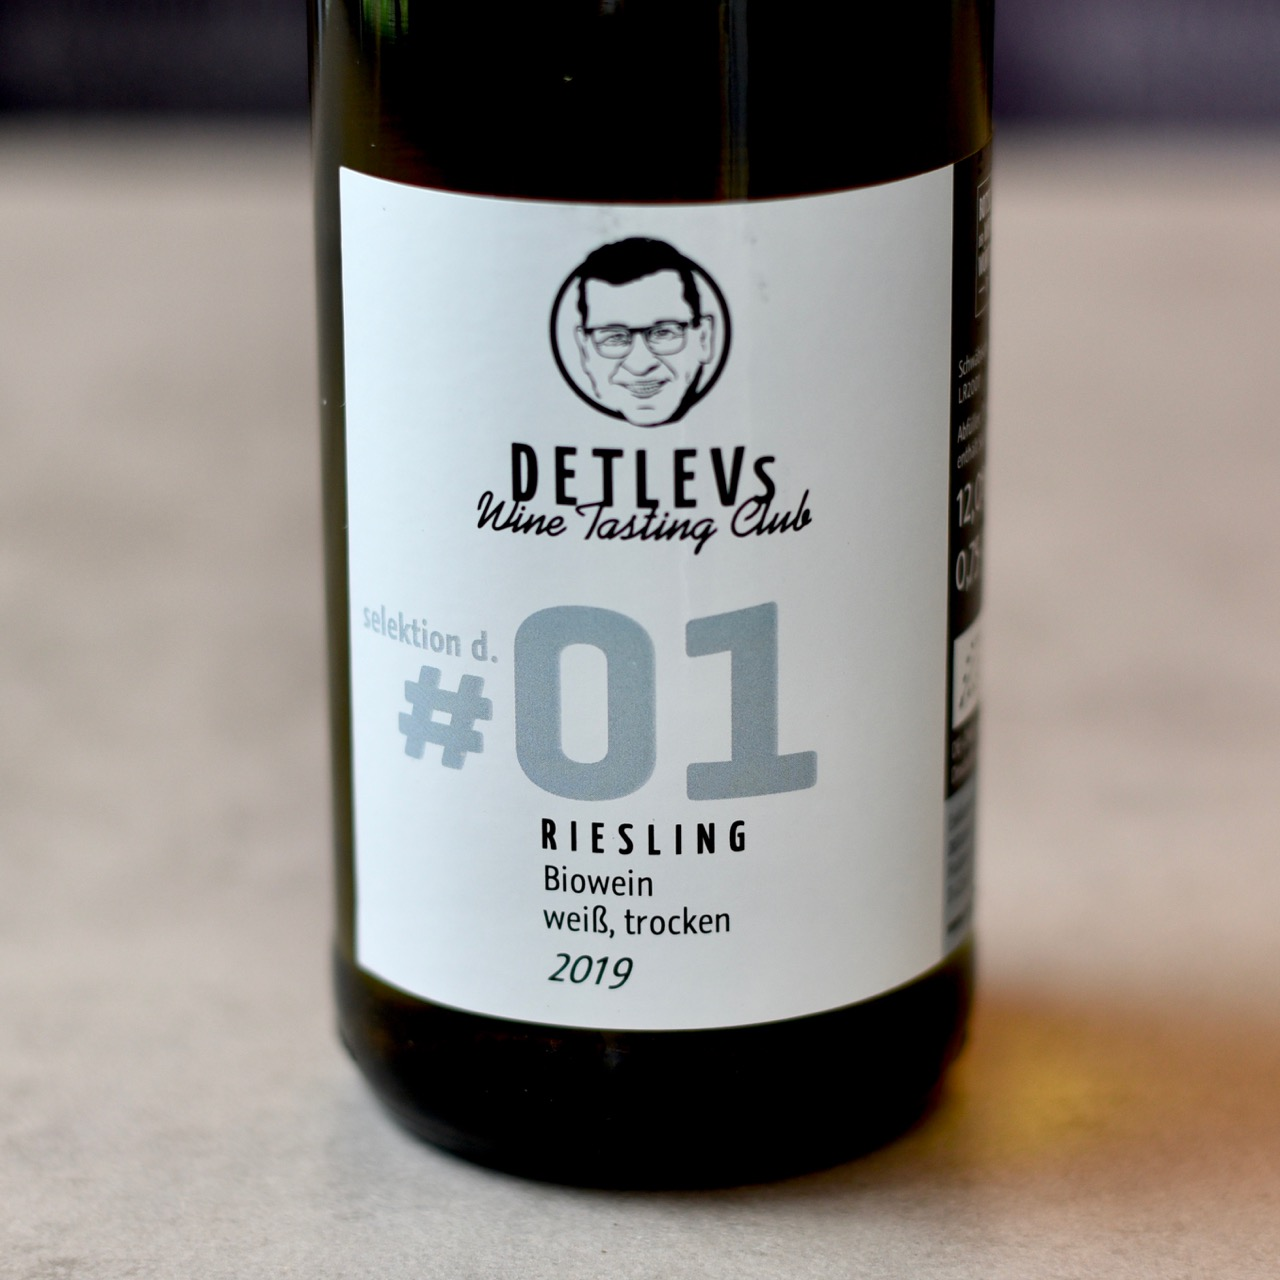 "DETLEVs ""selektion d."" No. 01 Riesling, bio, 2019"